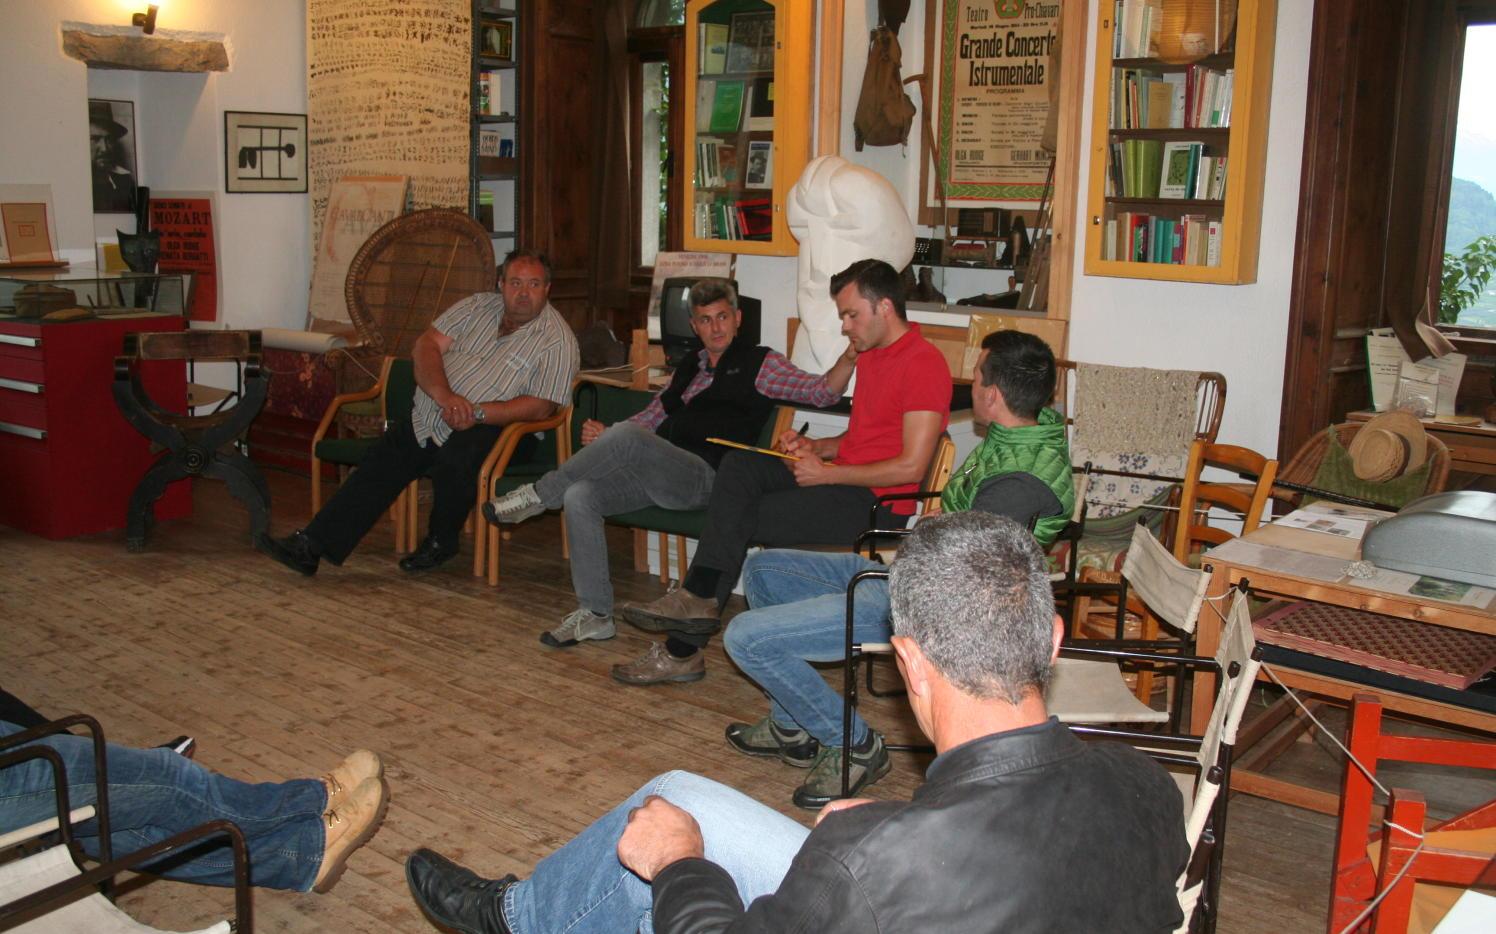 2014_Brunnenburg Dorf Tirol Bezirk_Bezirksklausur Offen Gredt 2